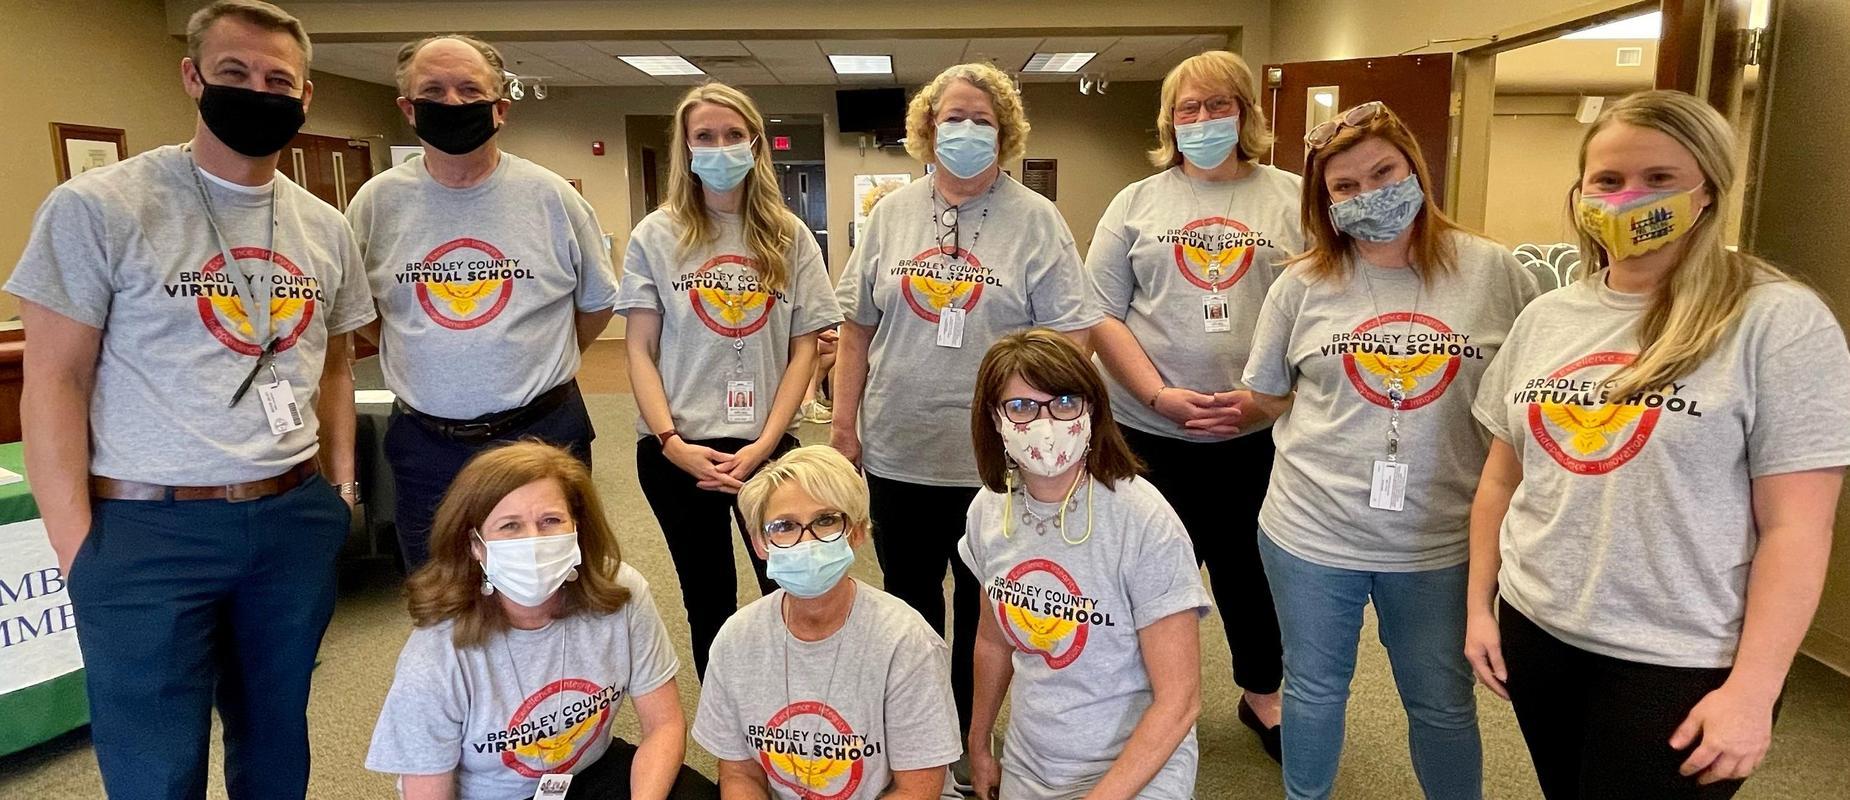 BCVS Staff, Bradley County Virtual School, Virtual, Bradley County